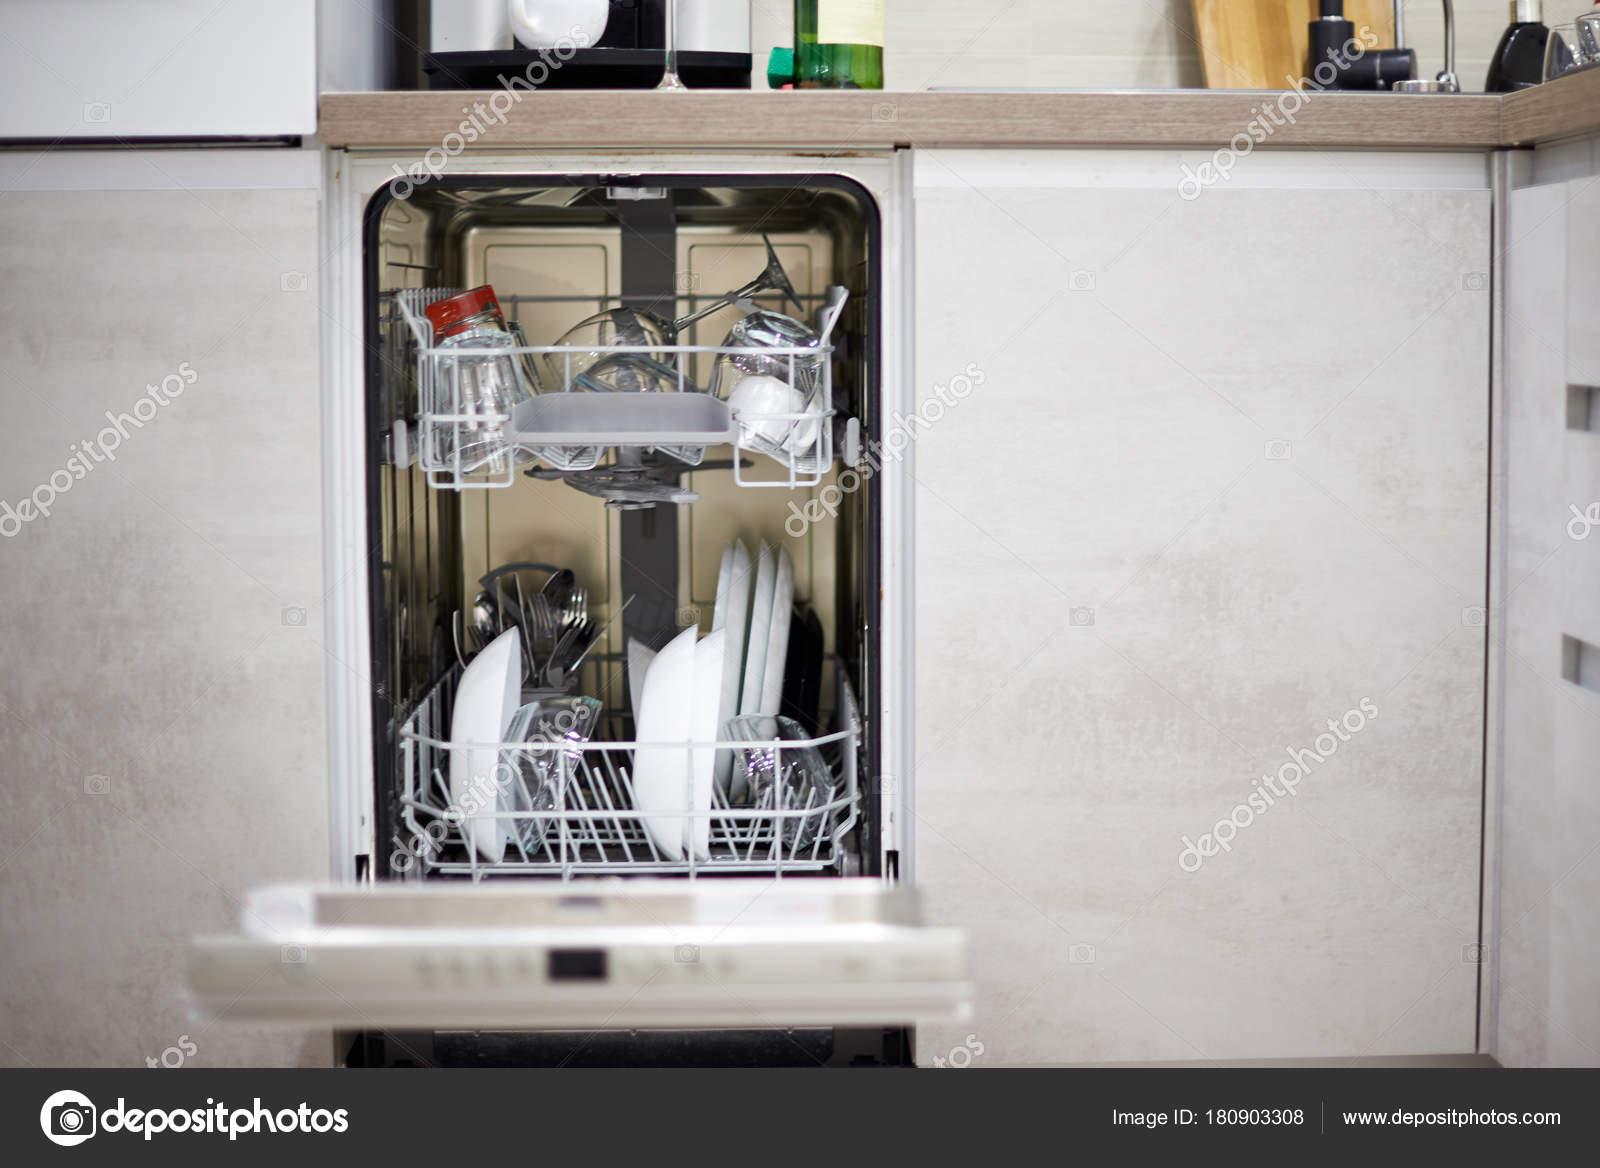 kitchen dishwashers aid range 现代厨房洗碗机 图库照片 c dimarik 180903308